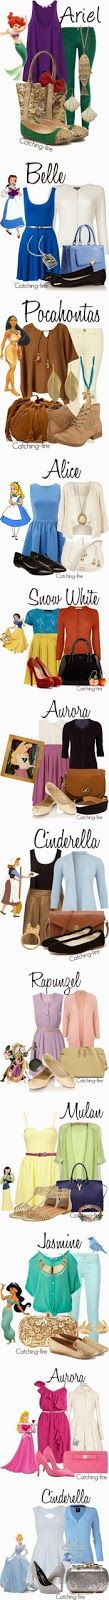 Teens Disney fashion inspiration | Fashion World. Love the last Cinderella one.